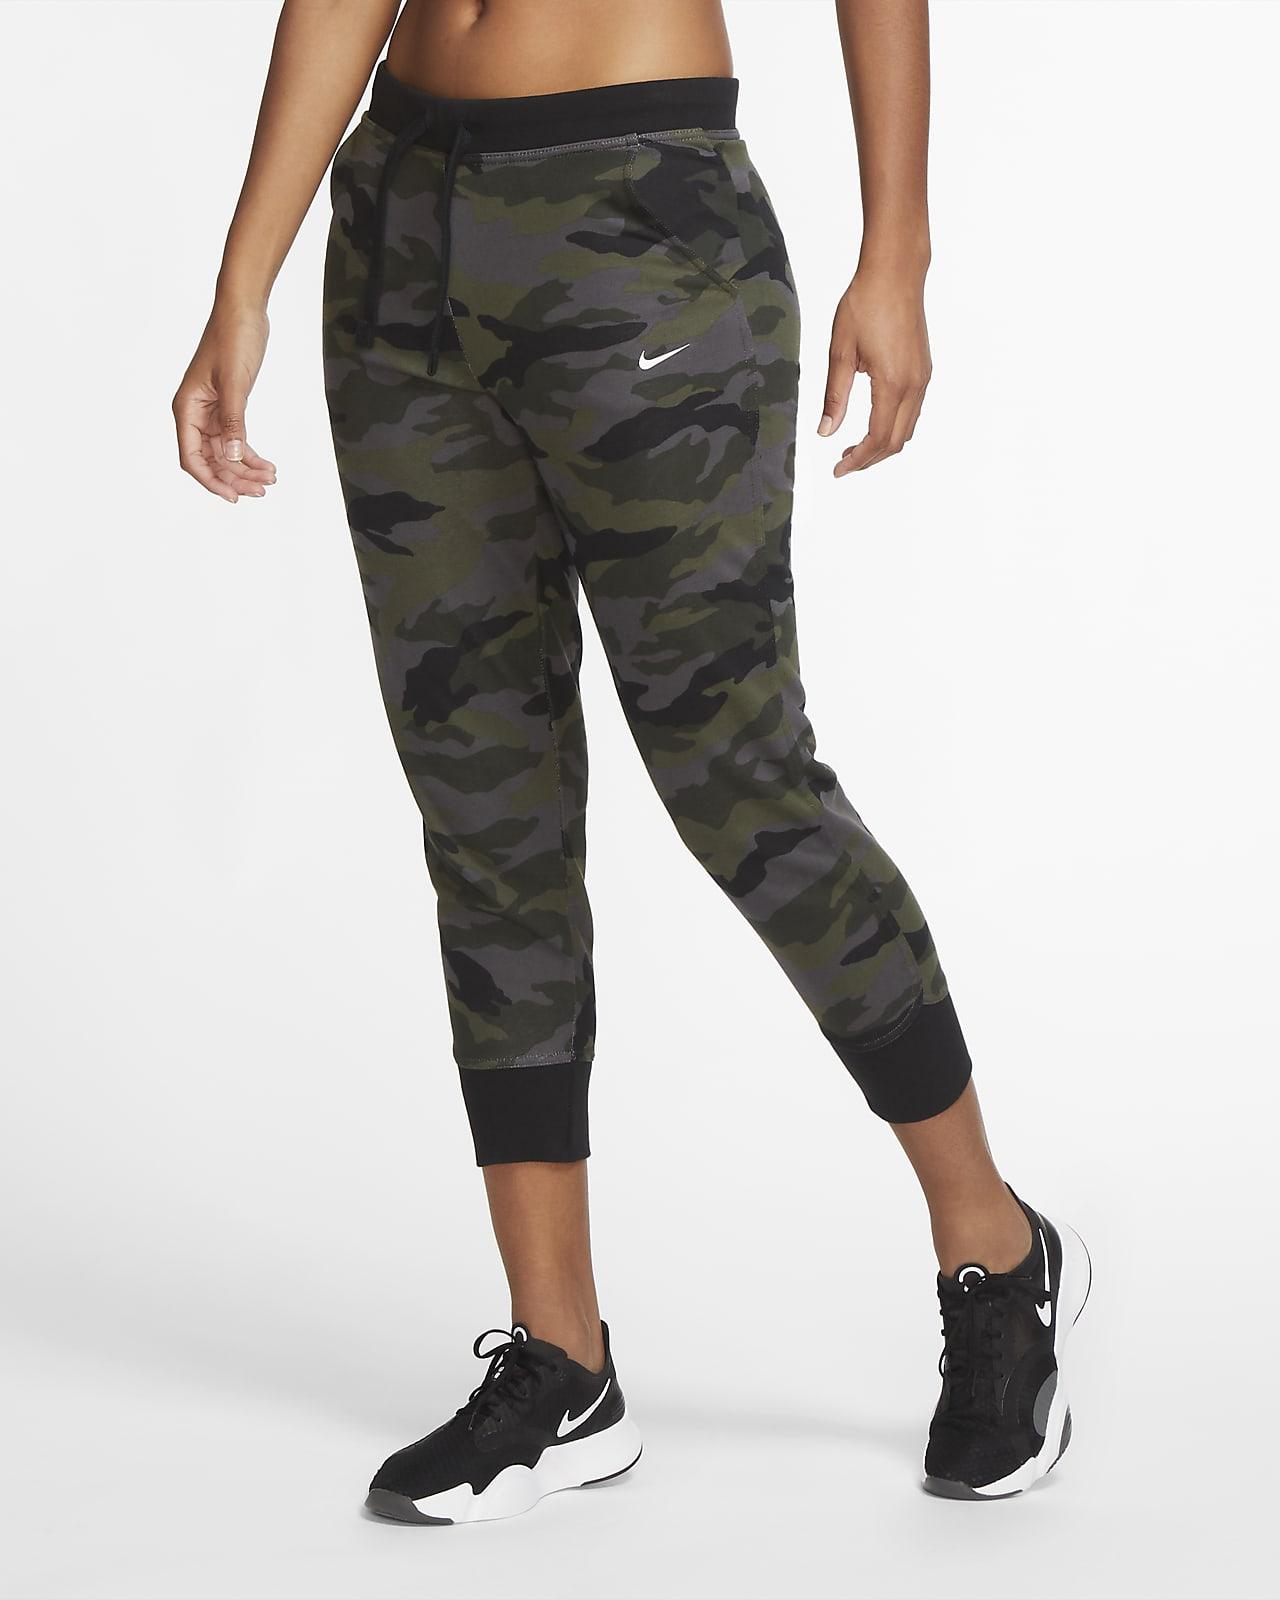 Nike Dri-FIT Get Fit Women's 7/8 Camo Training Trousers